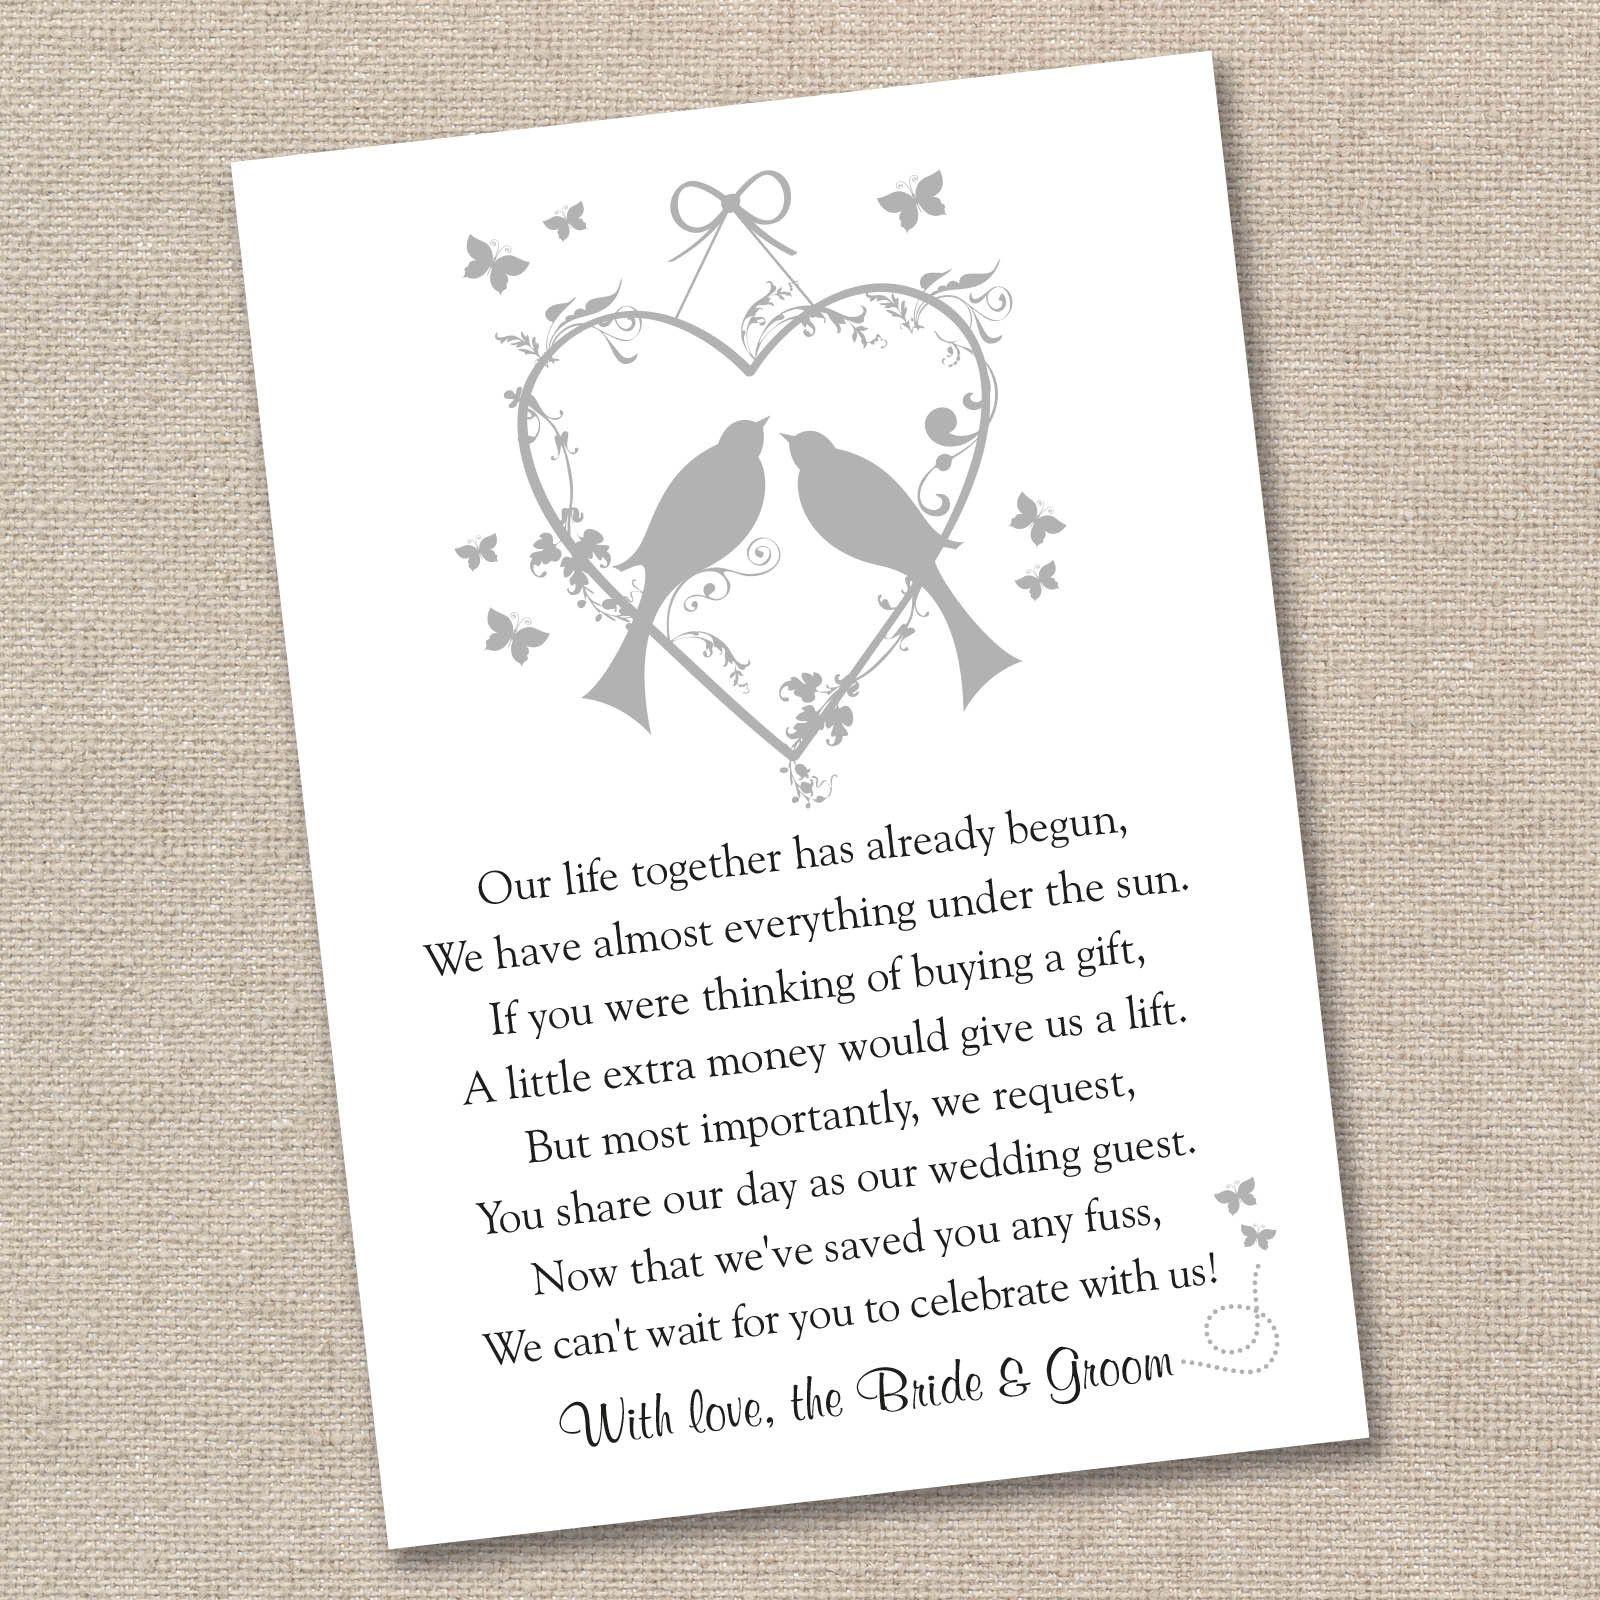 Wedding Invite Poems Asking For Money For Honeymoon: 25 X Vintage Lovebirds Wedding Poem Cards For Your